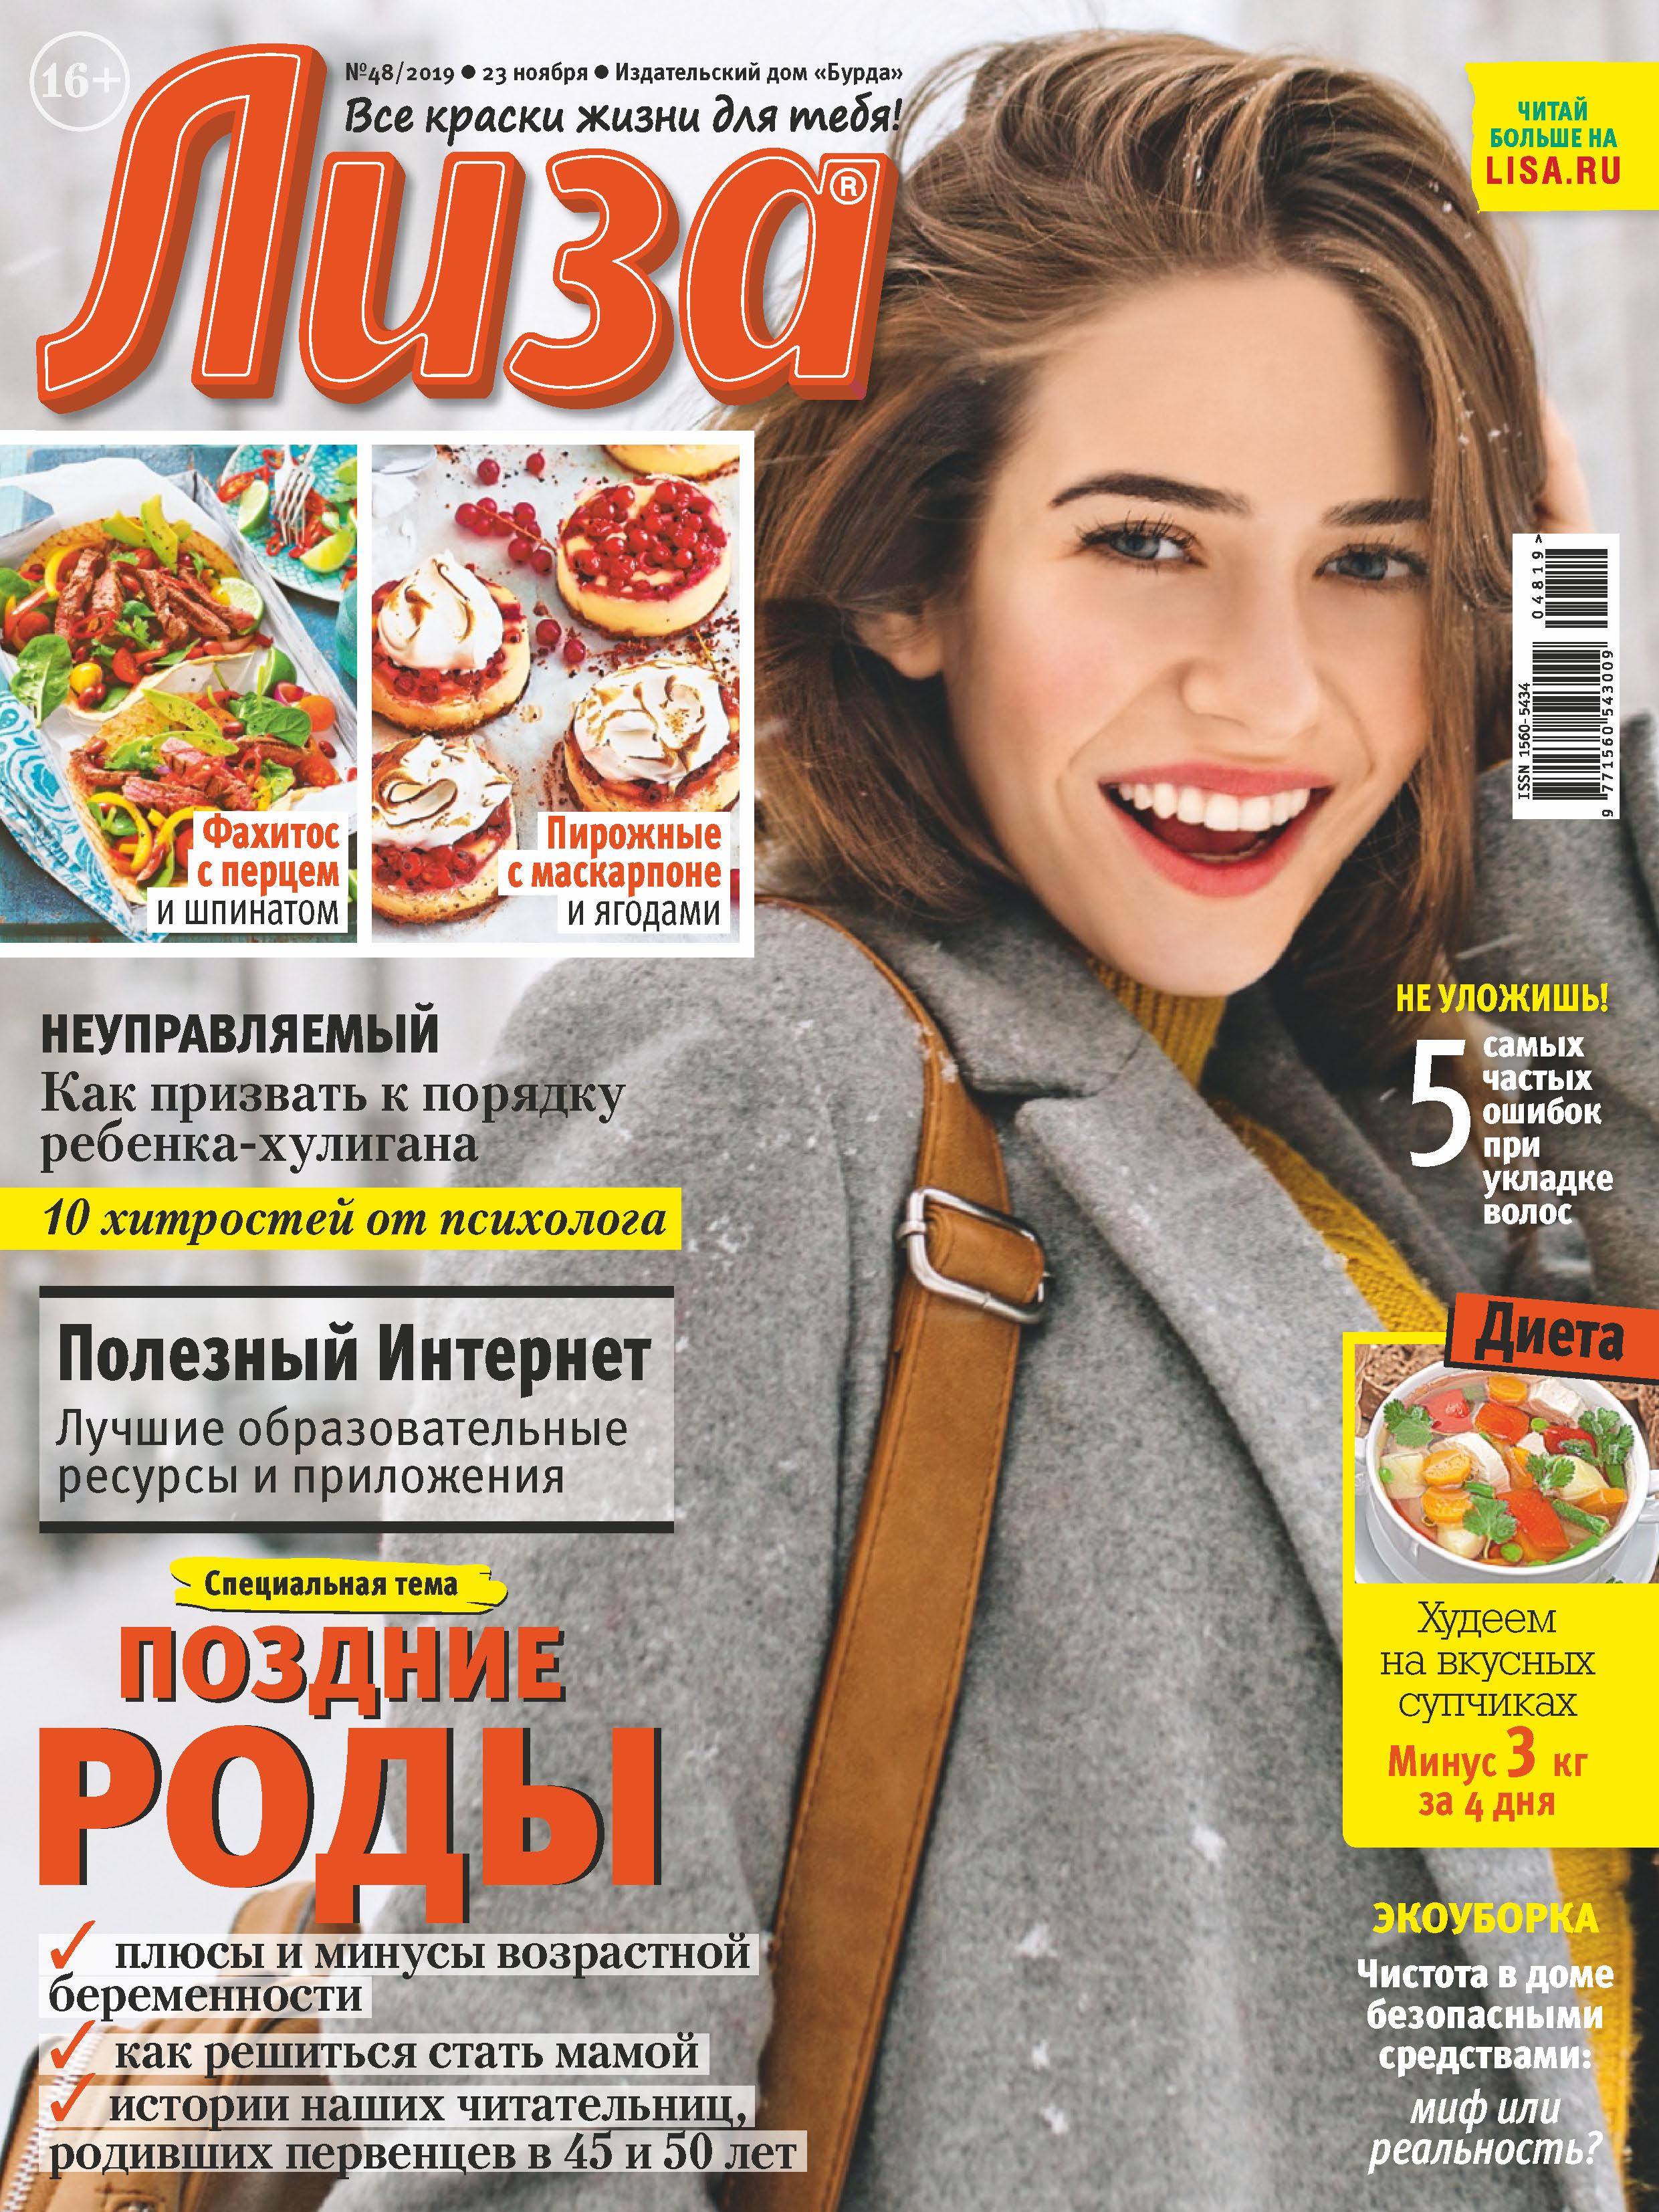 Журнал «Лиза» №48/2019